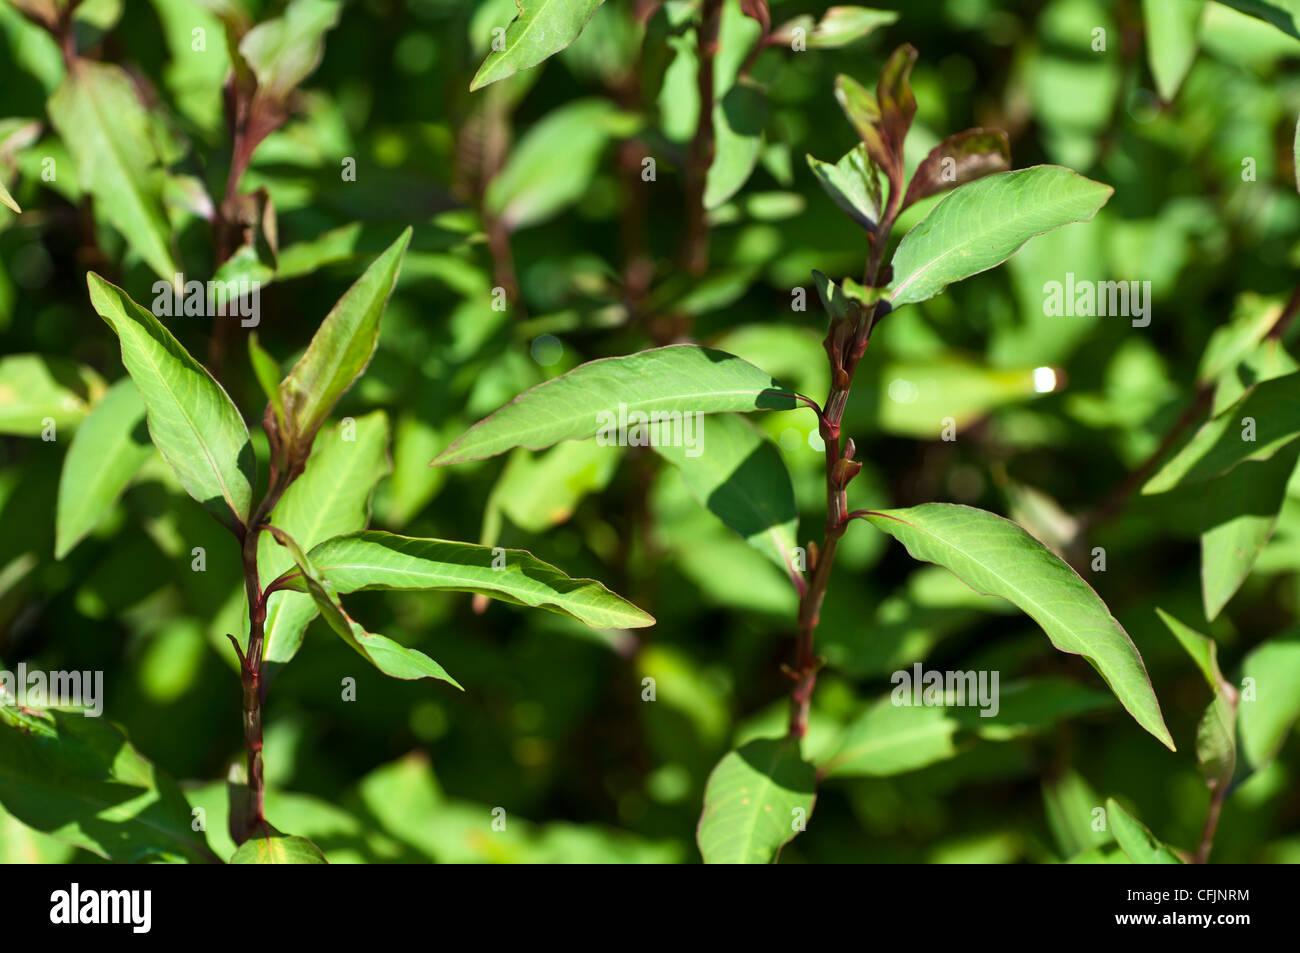 Green plant of Ramie, Boehmeria Nivea, Urticaceae, fiber plant - Stock Image